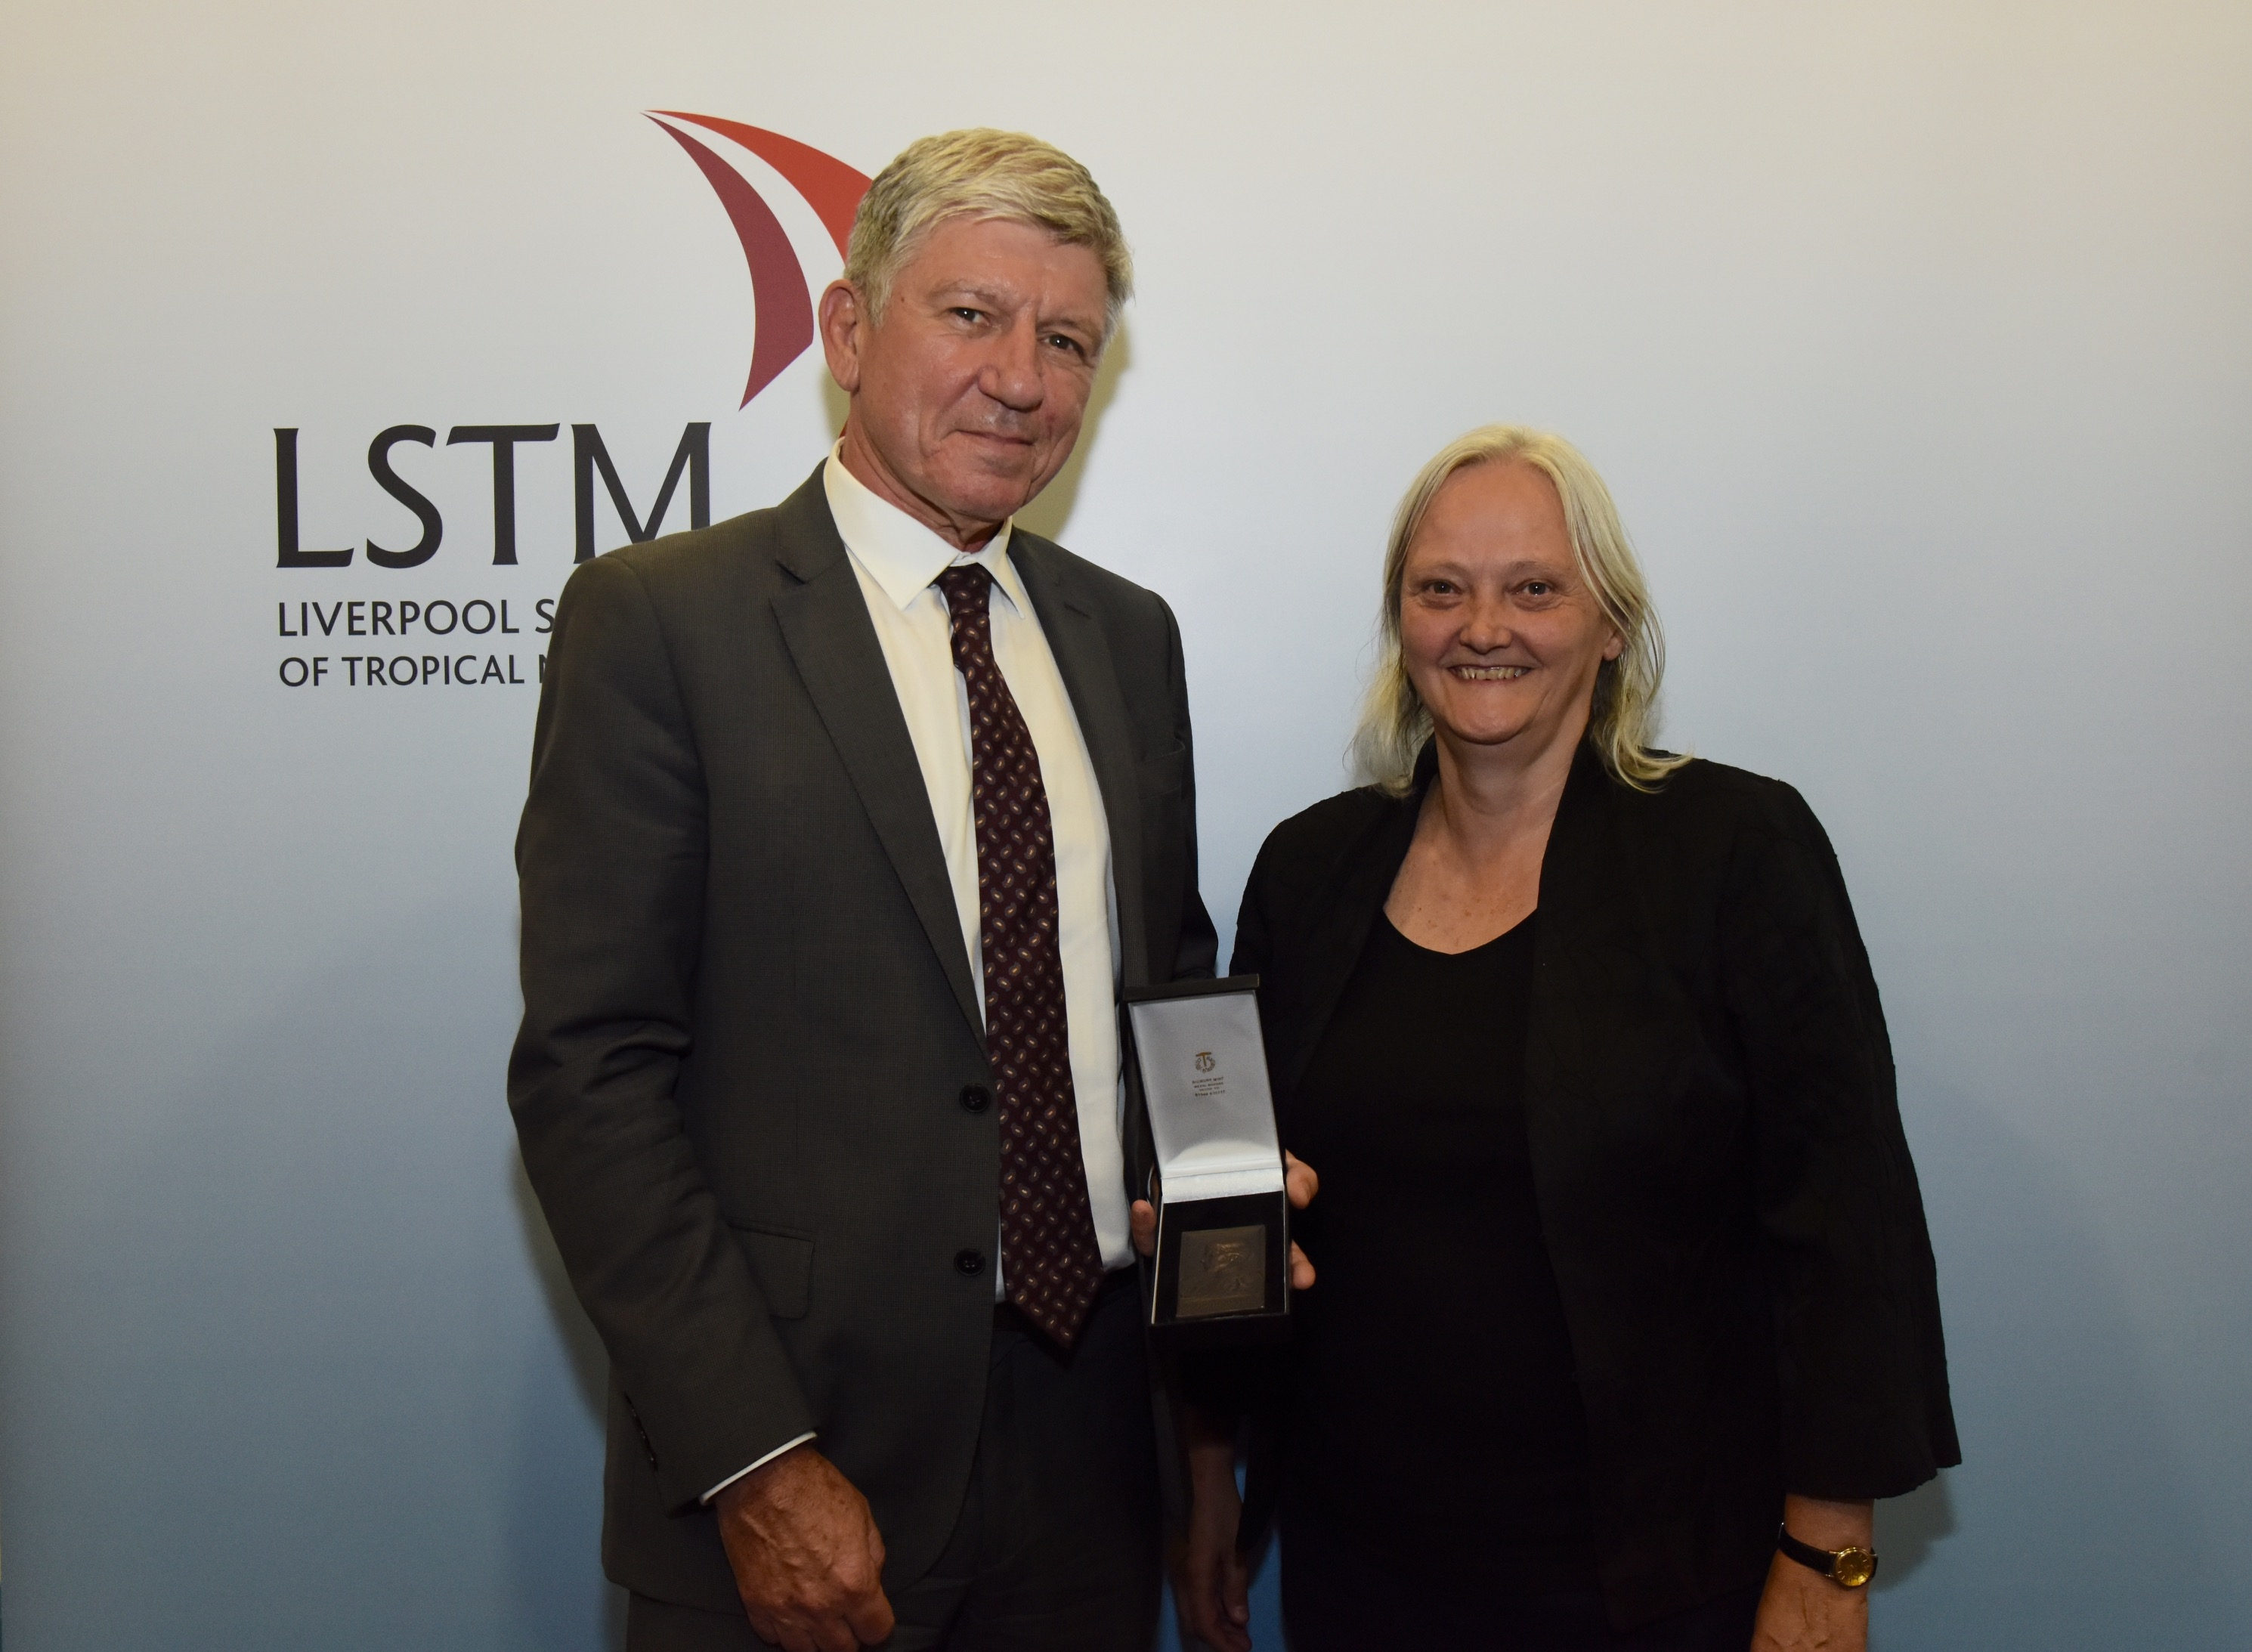 Professor Kevin Marsh receives the Kingsley medal from LSTM Director, Professor Janet Hemingway